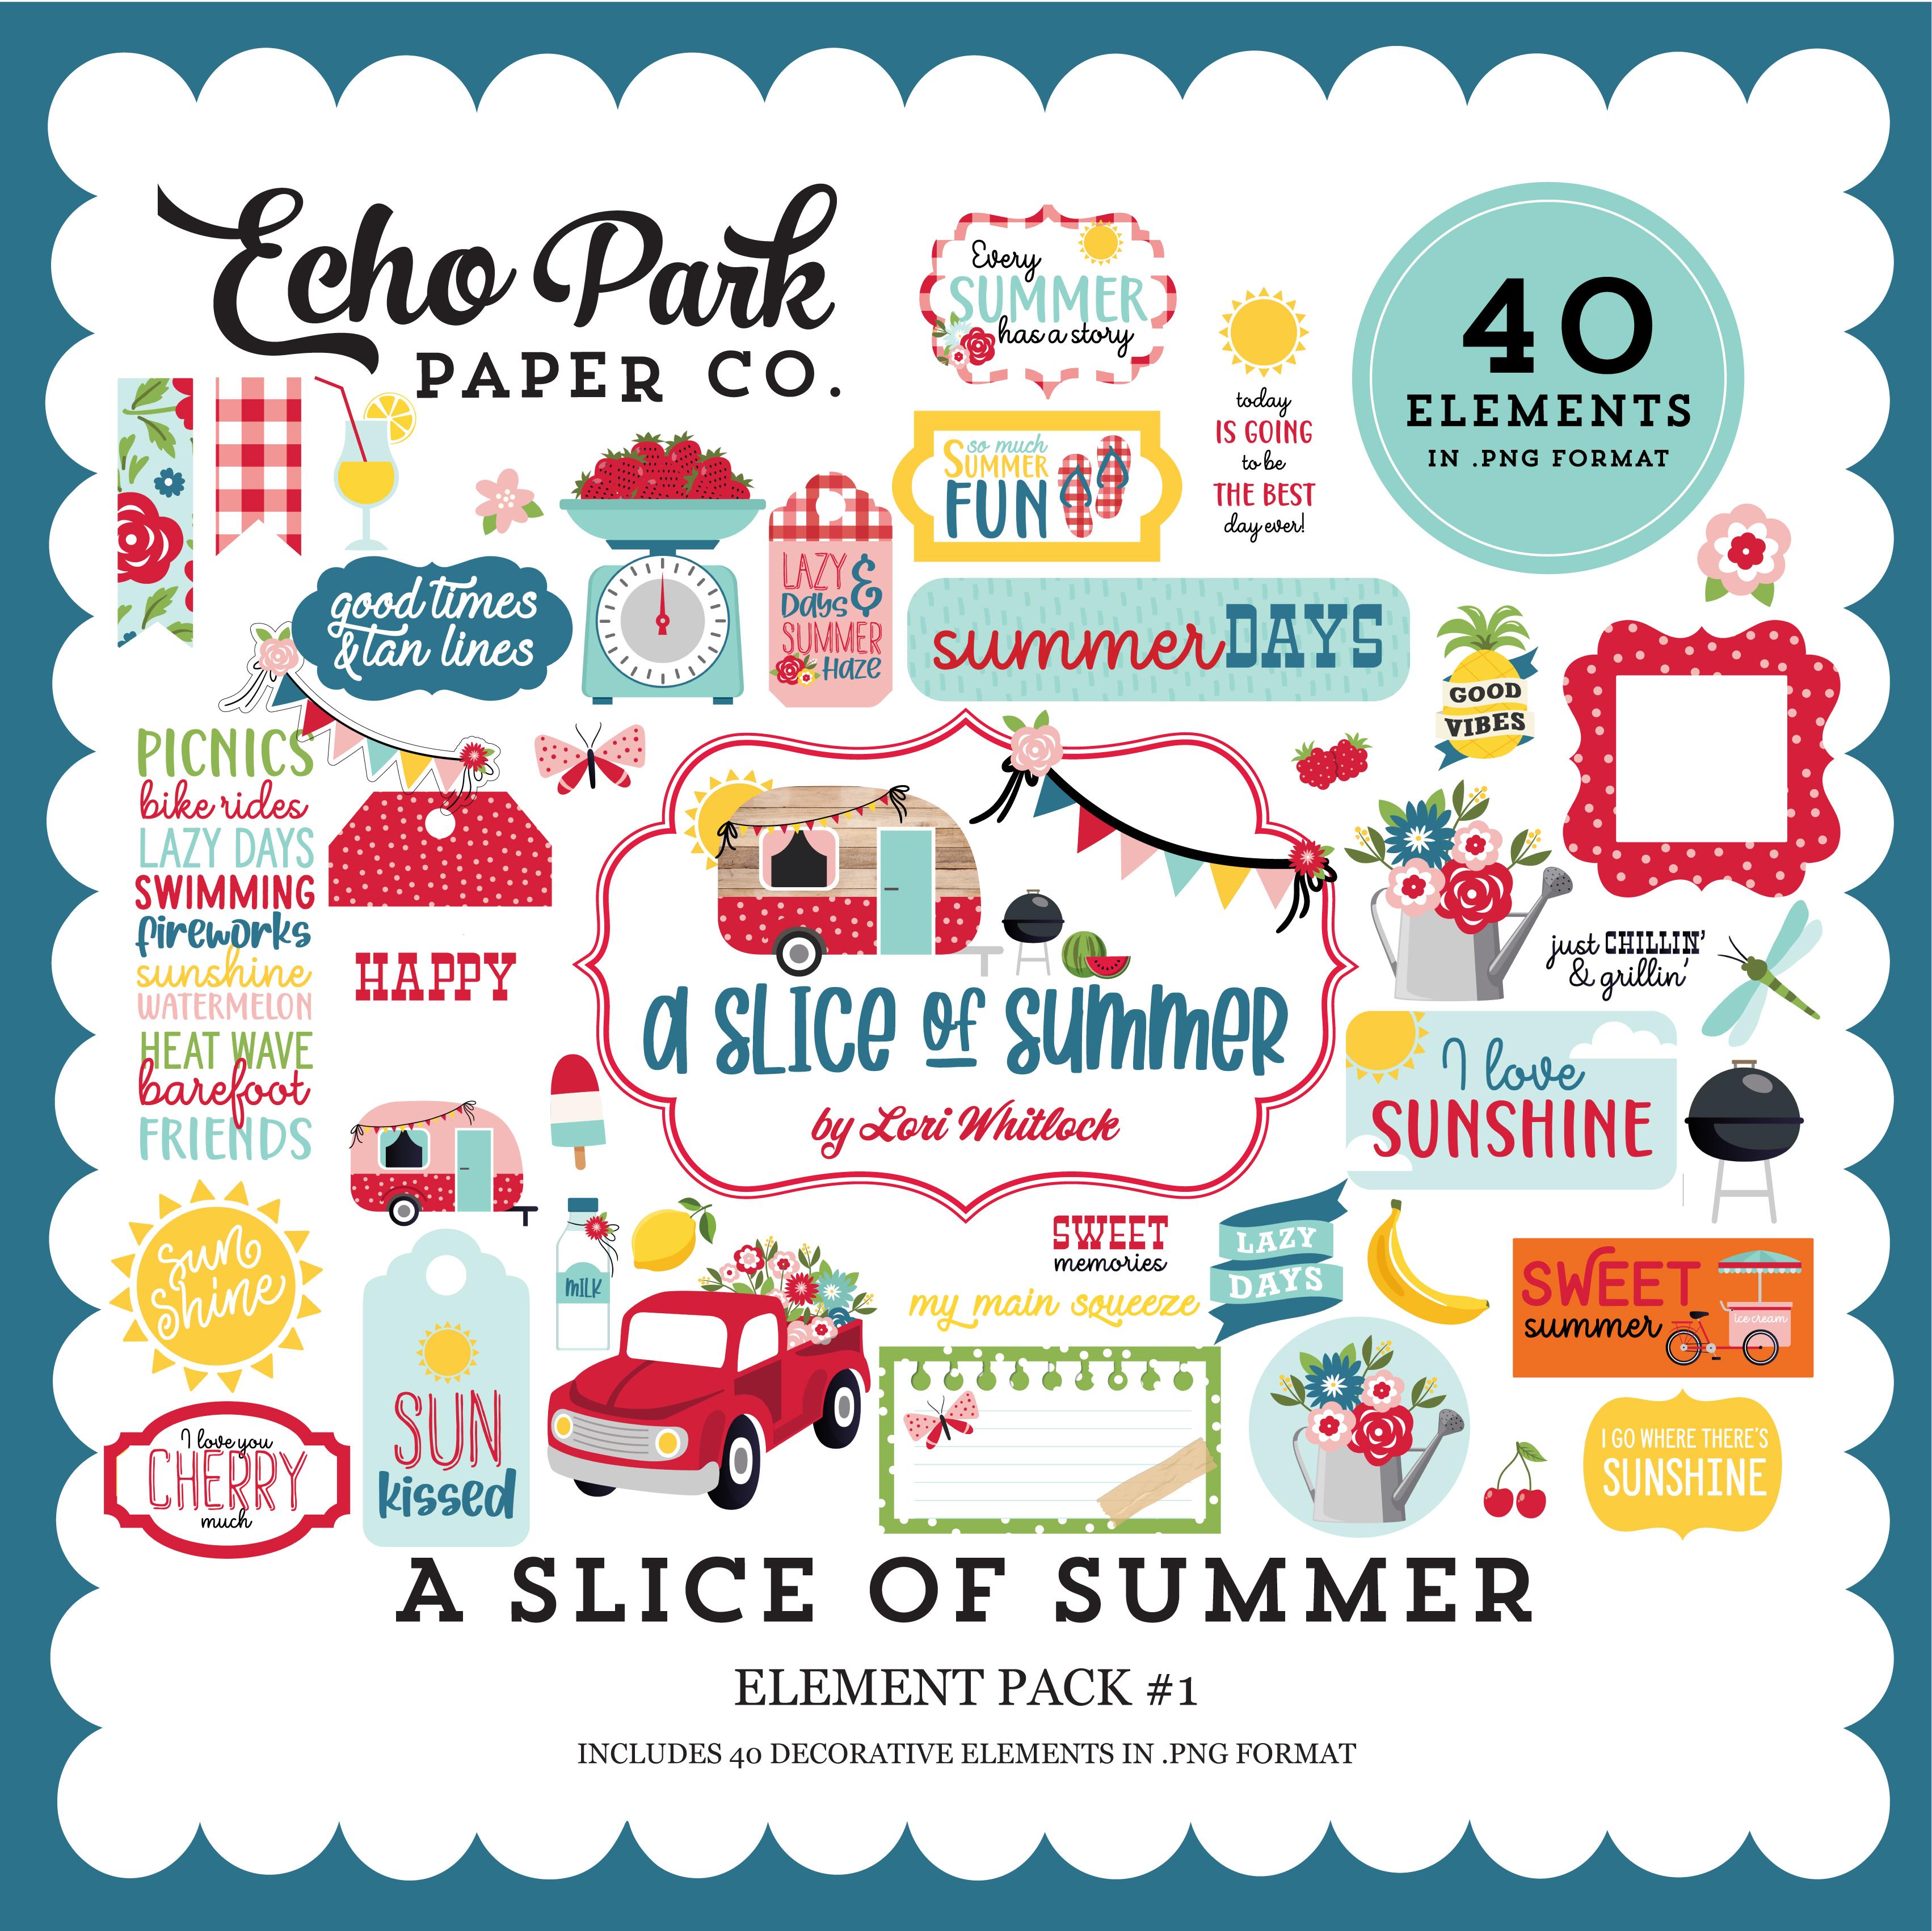 A Slice of Summer Element Pack #1